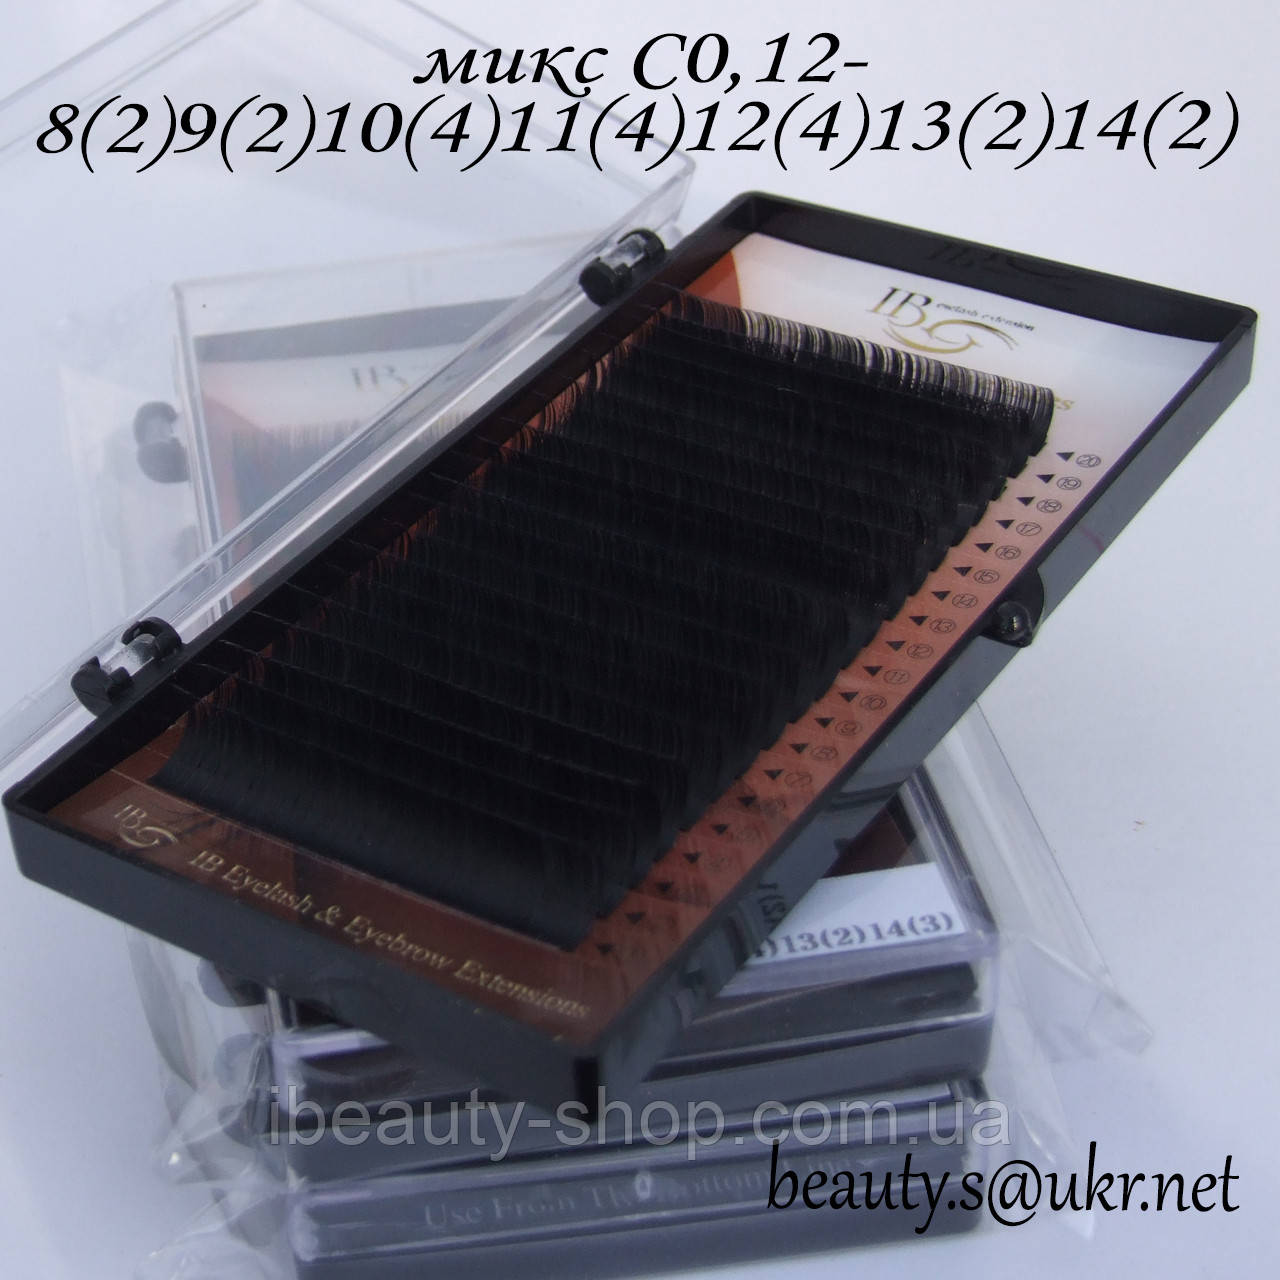 Ресницы I-Beauty микс С-0,12 8-14мм